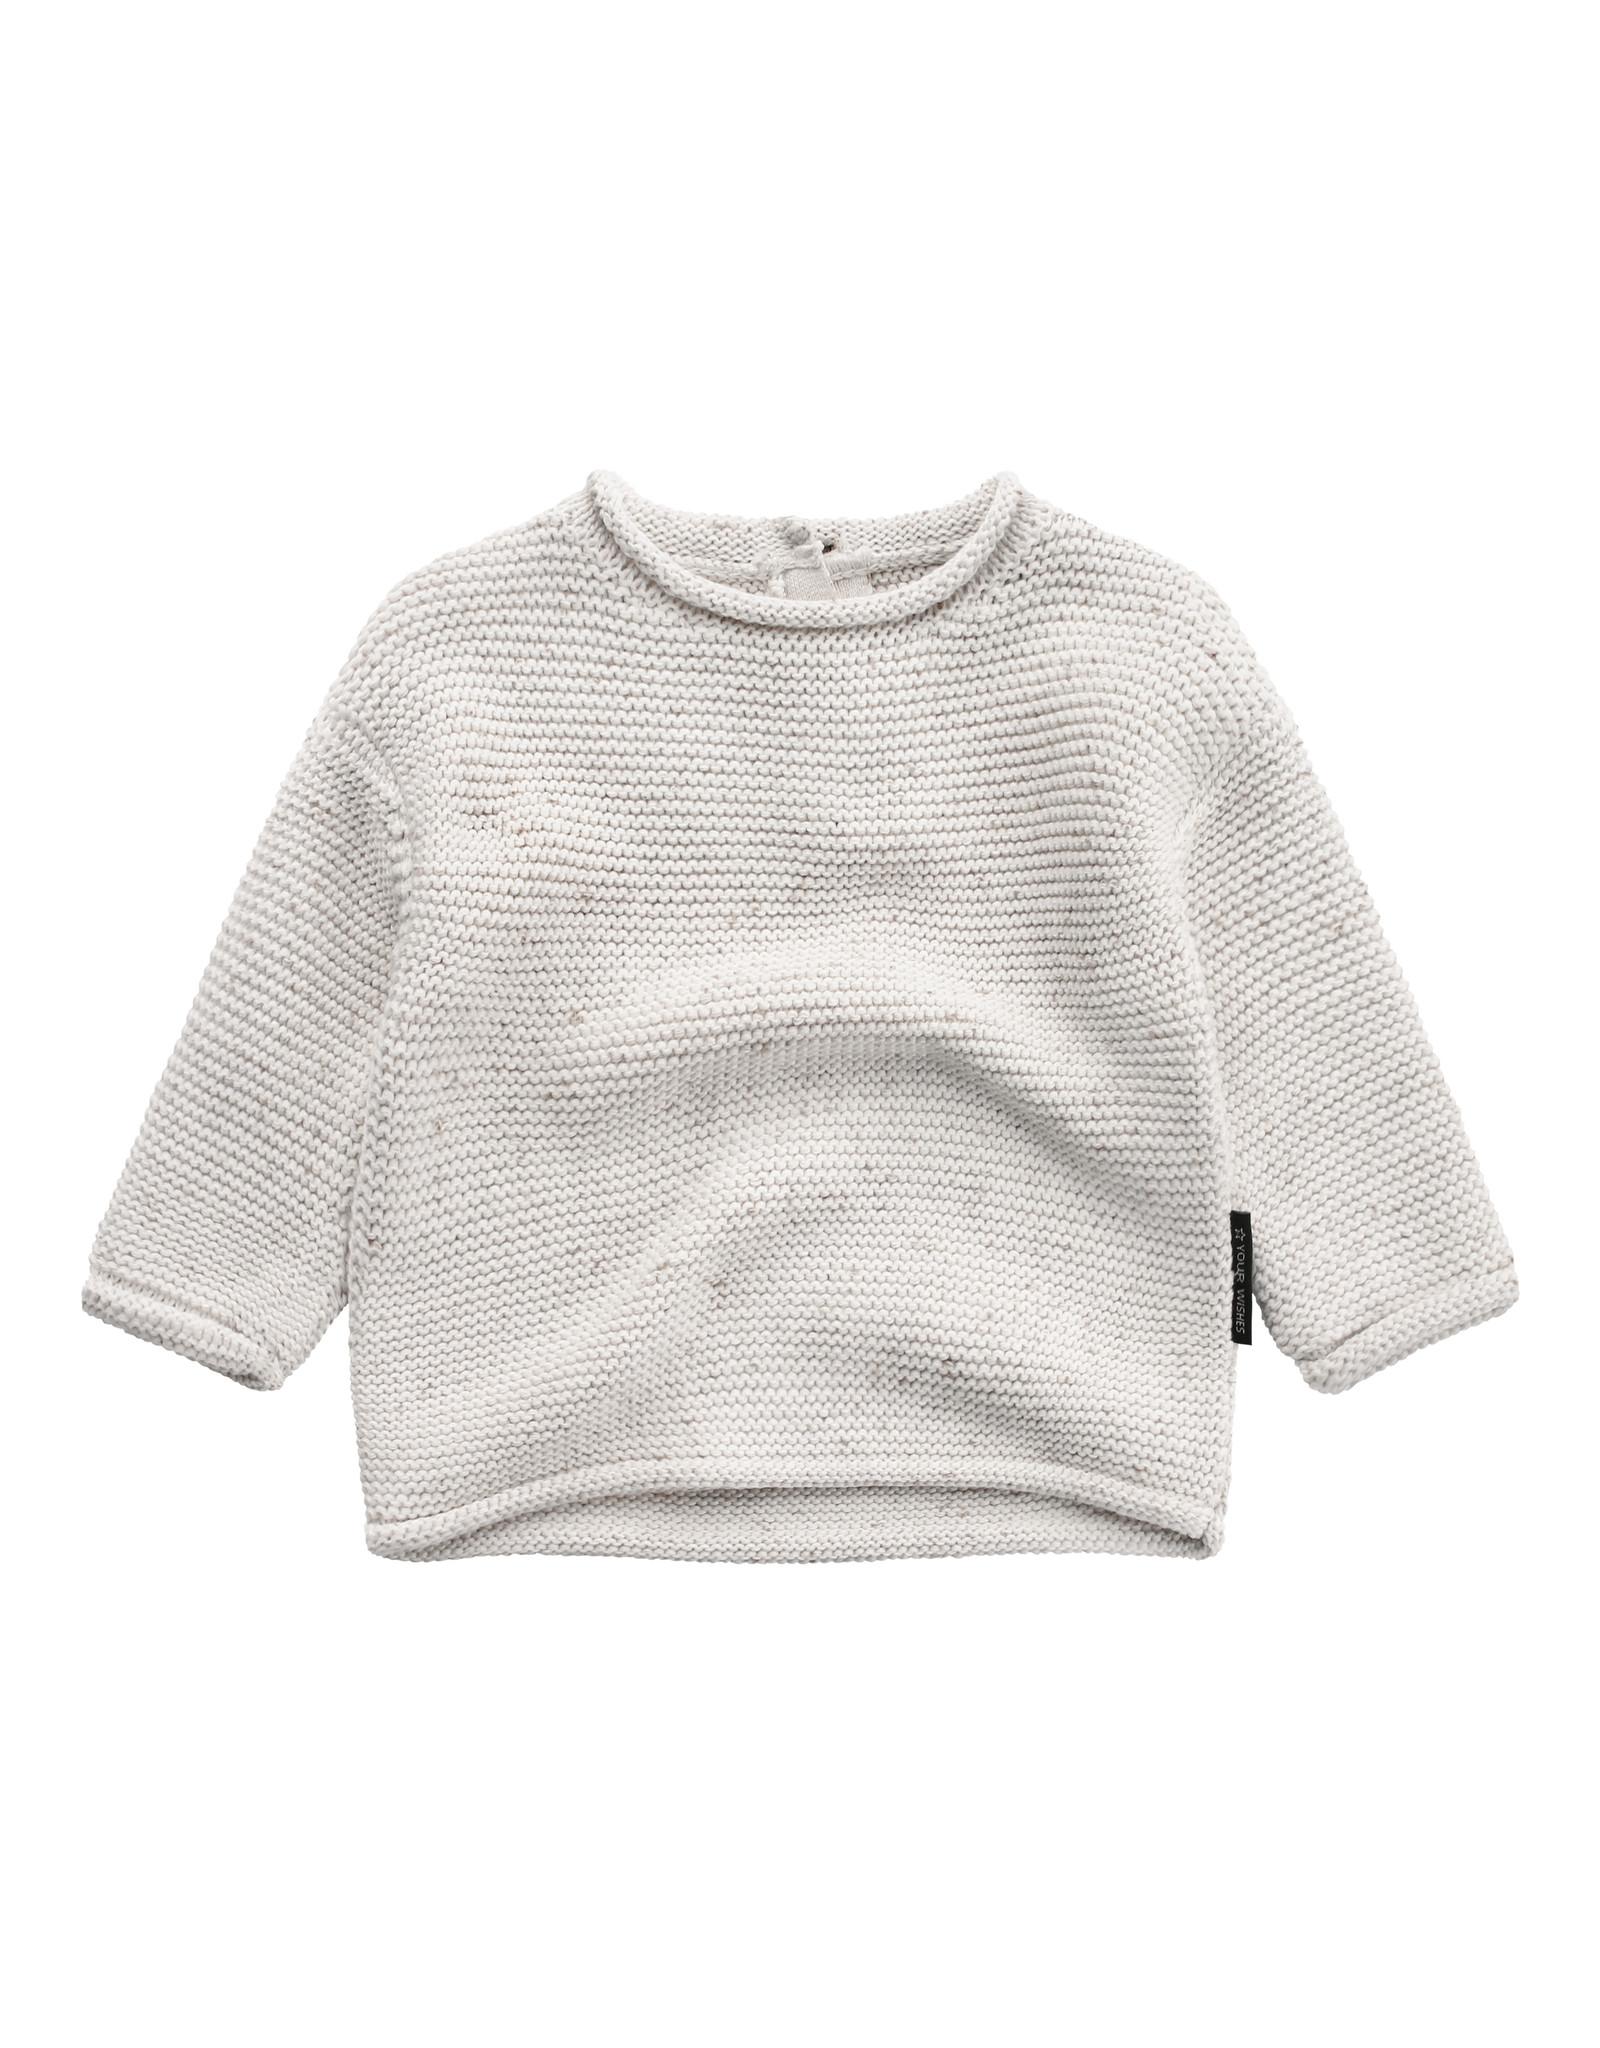 Your Wishes YW | Knit | Boxy Sweater | Chalk